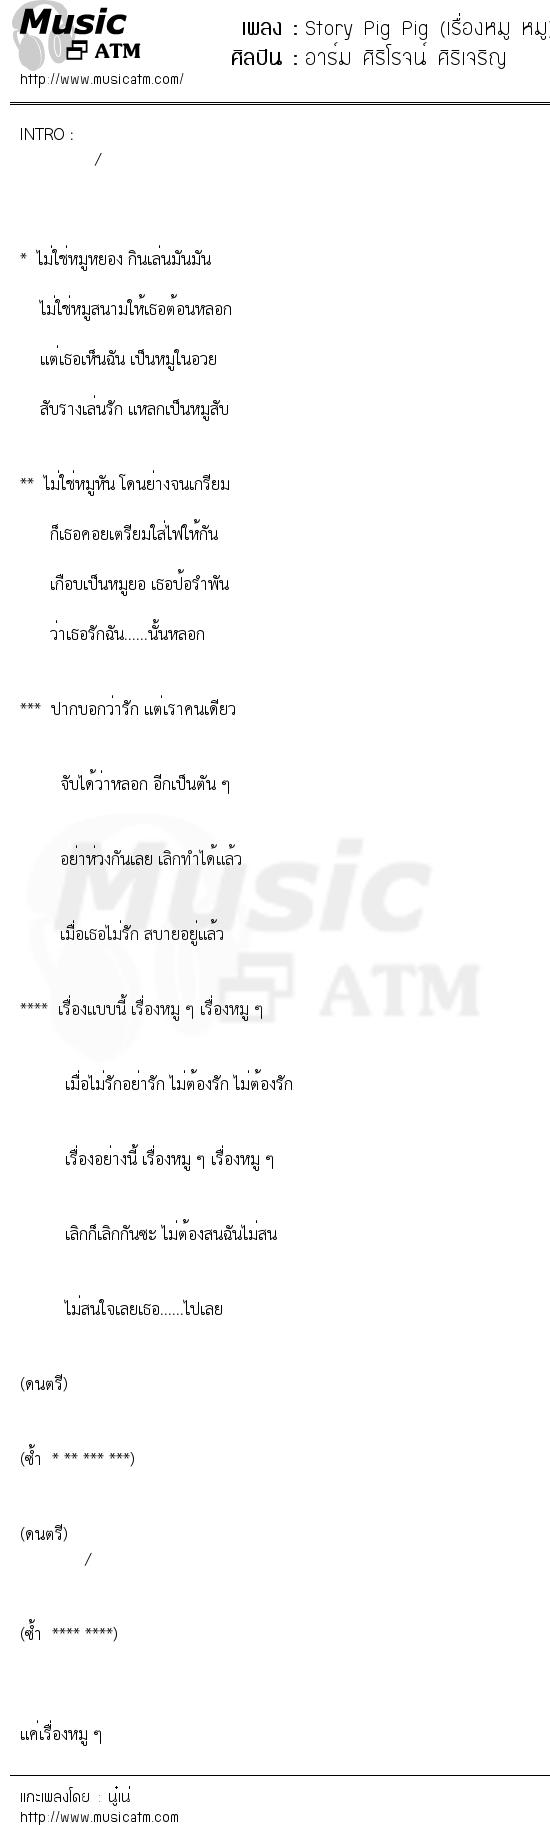 Story Pig Pig (เรื่องหมู หมู)   เพลงไทย